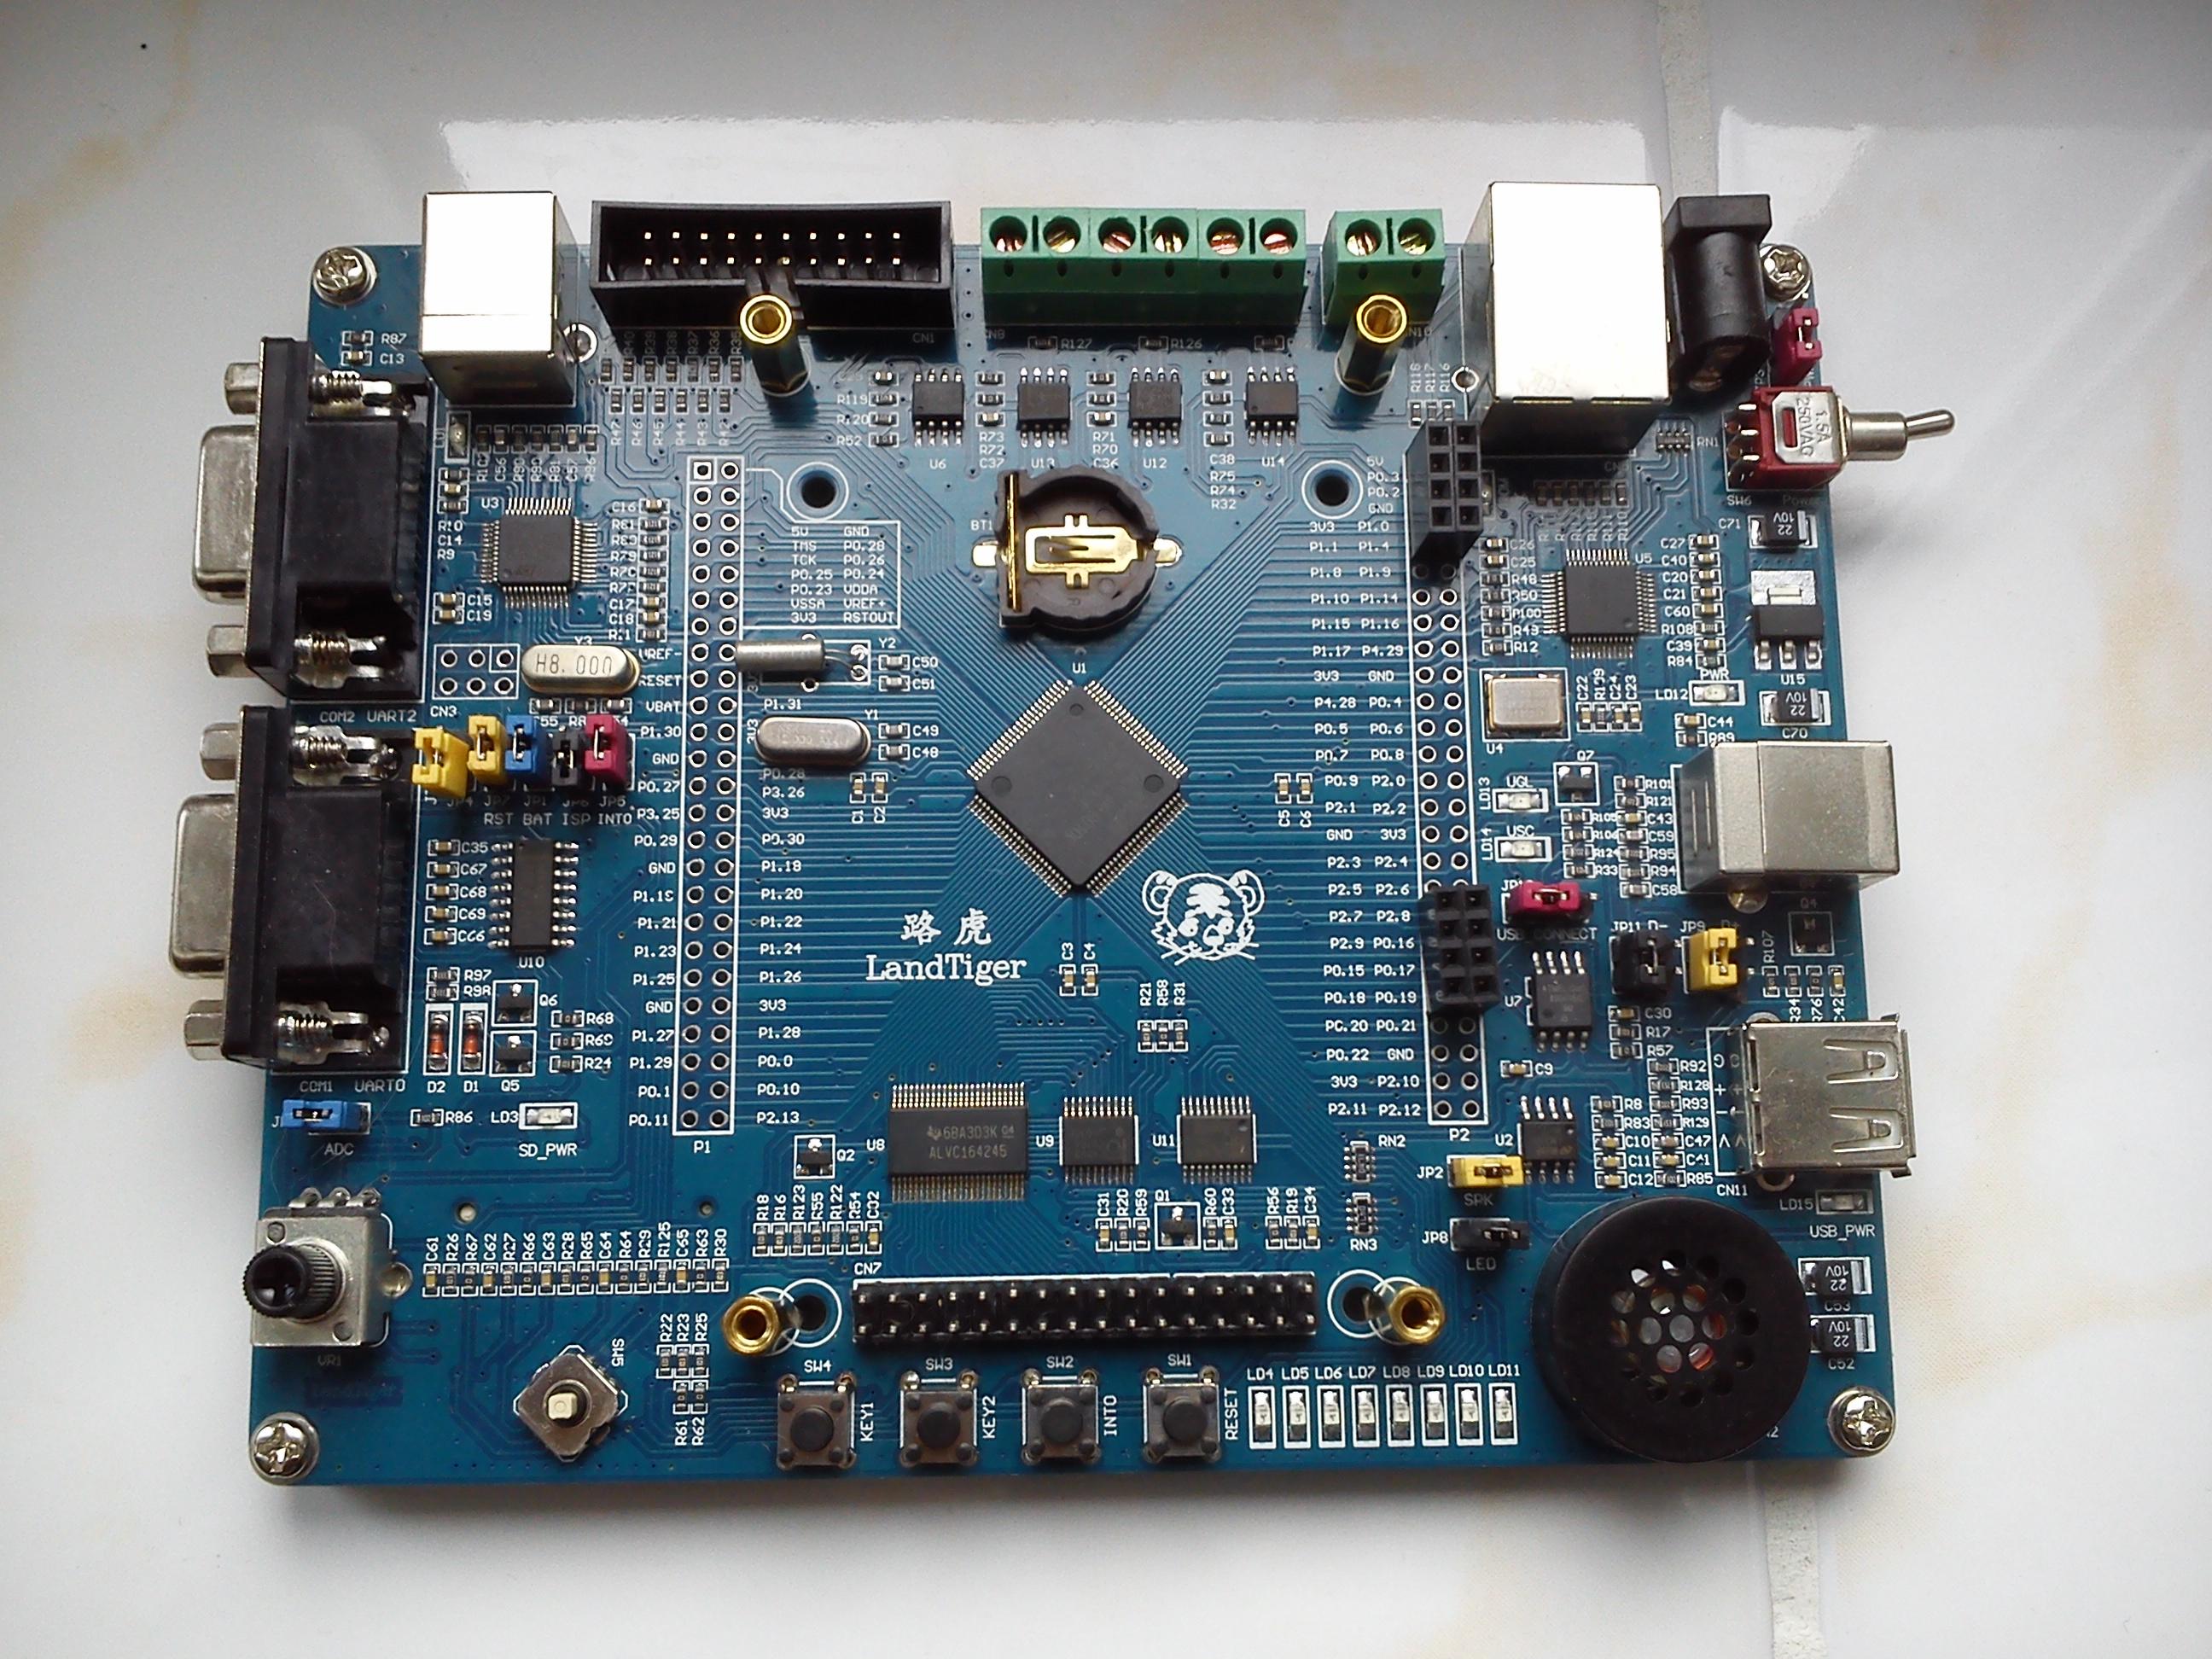 [Sprzedam] Zestaw uruchomieniowy NXP LPC 1768 LandTiger Dev. Board